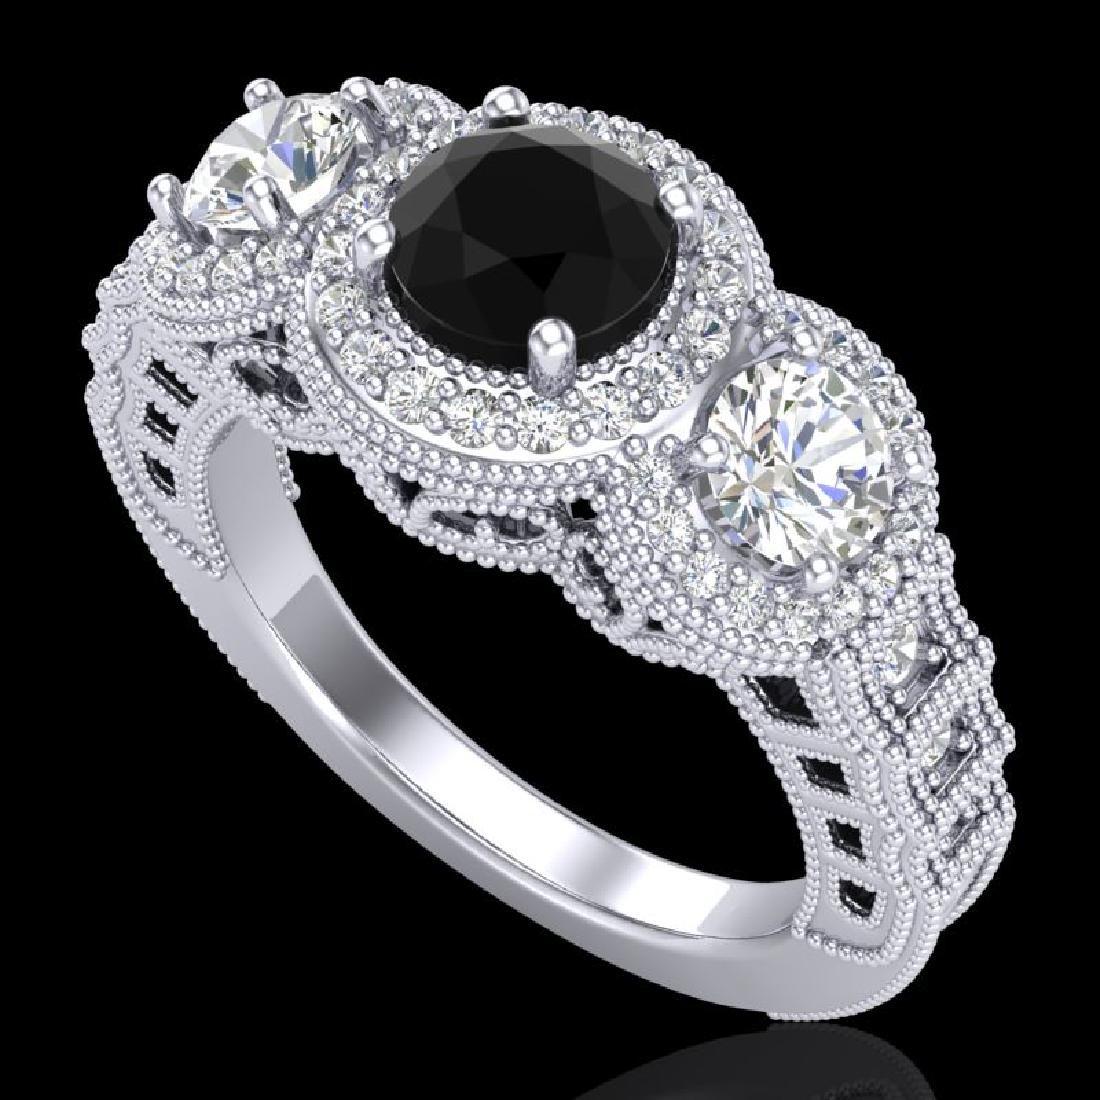 2.16 CTW Fancy Black Diamond Solitaire Art Deco 3 Stone